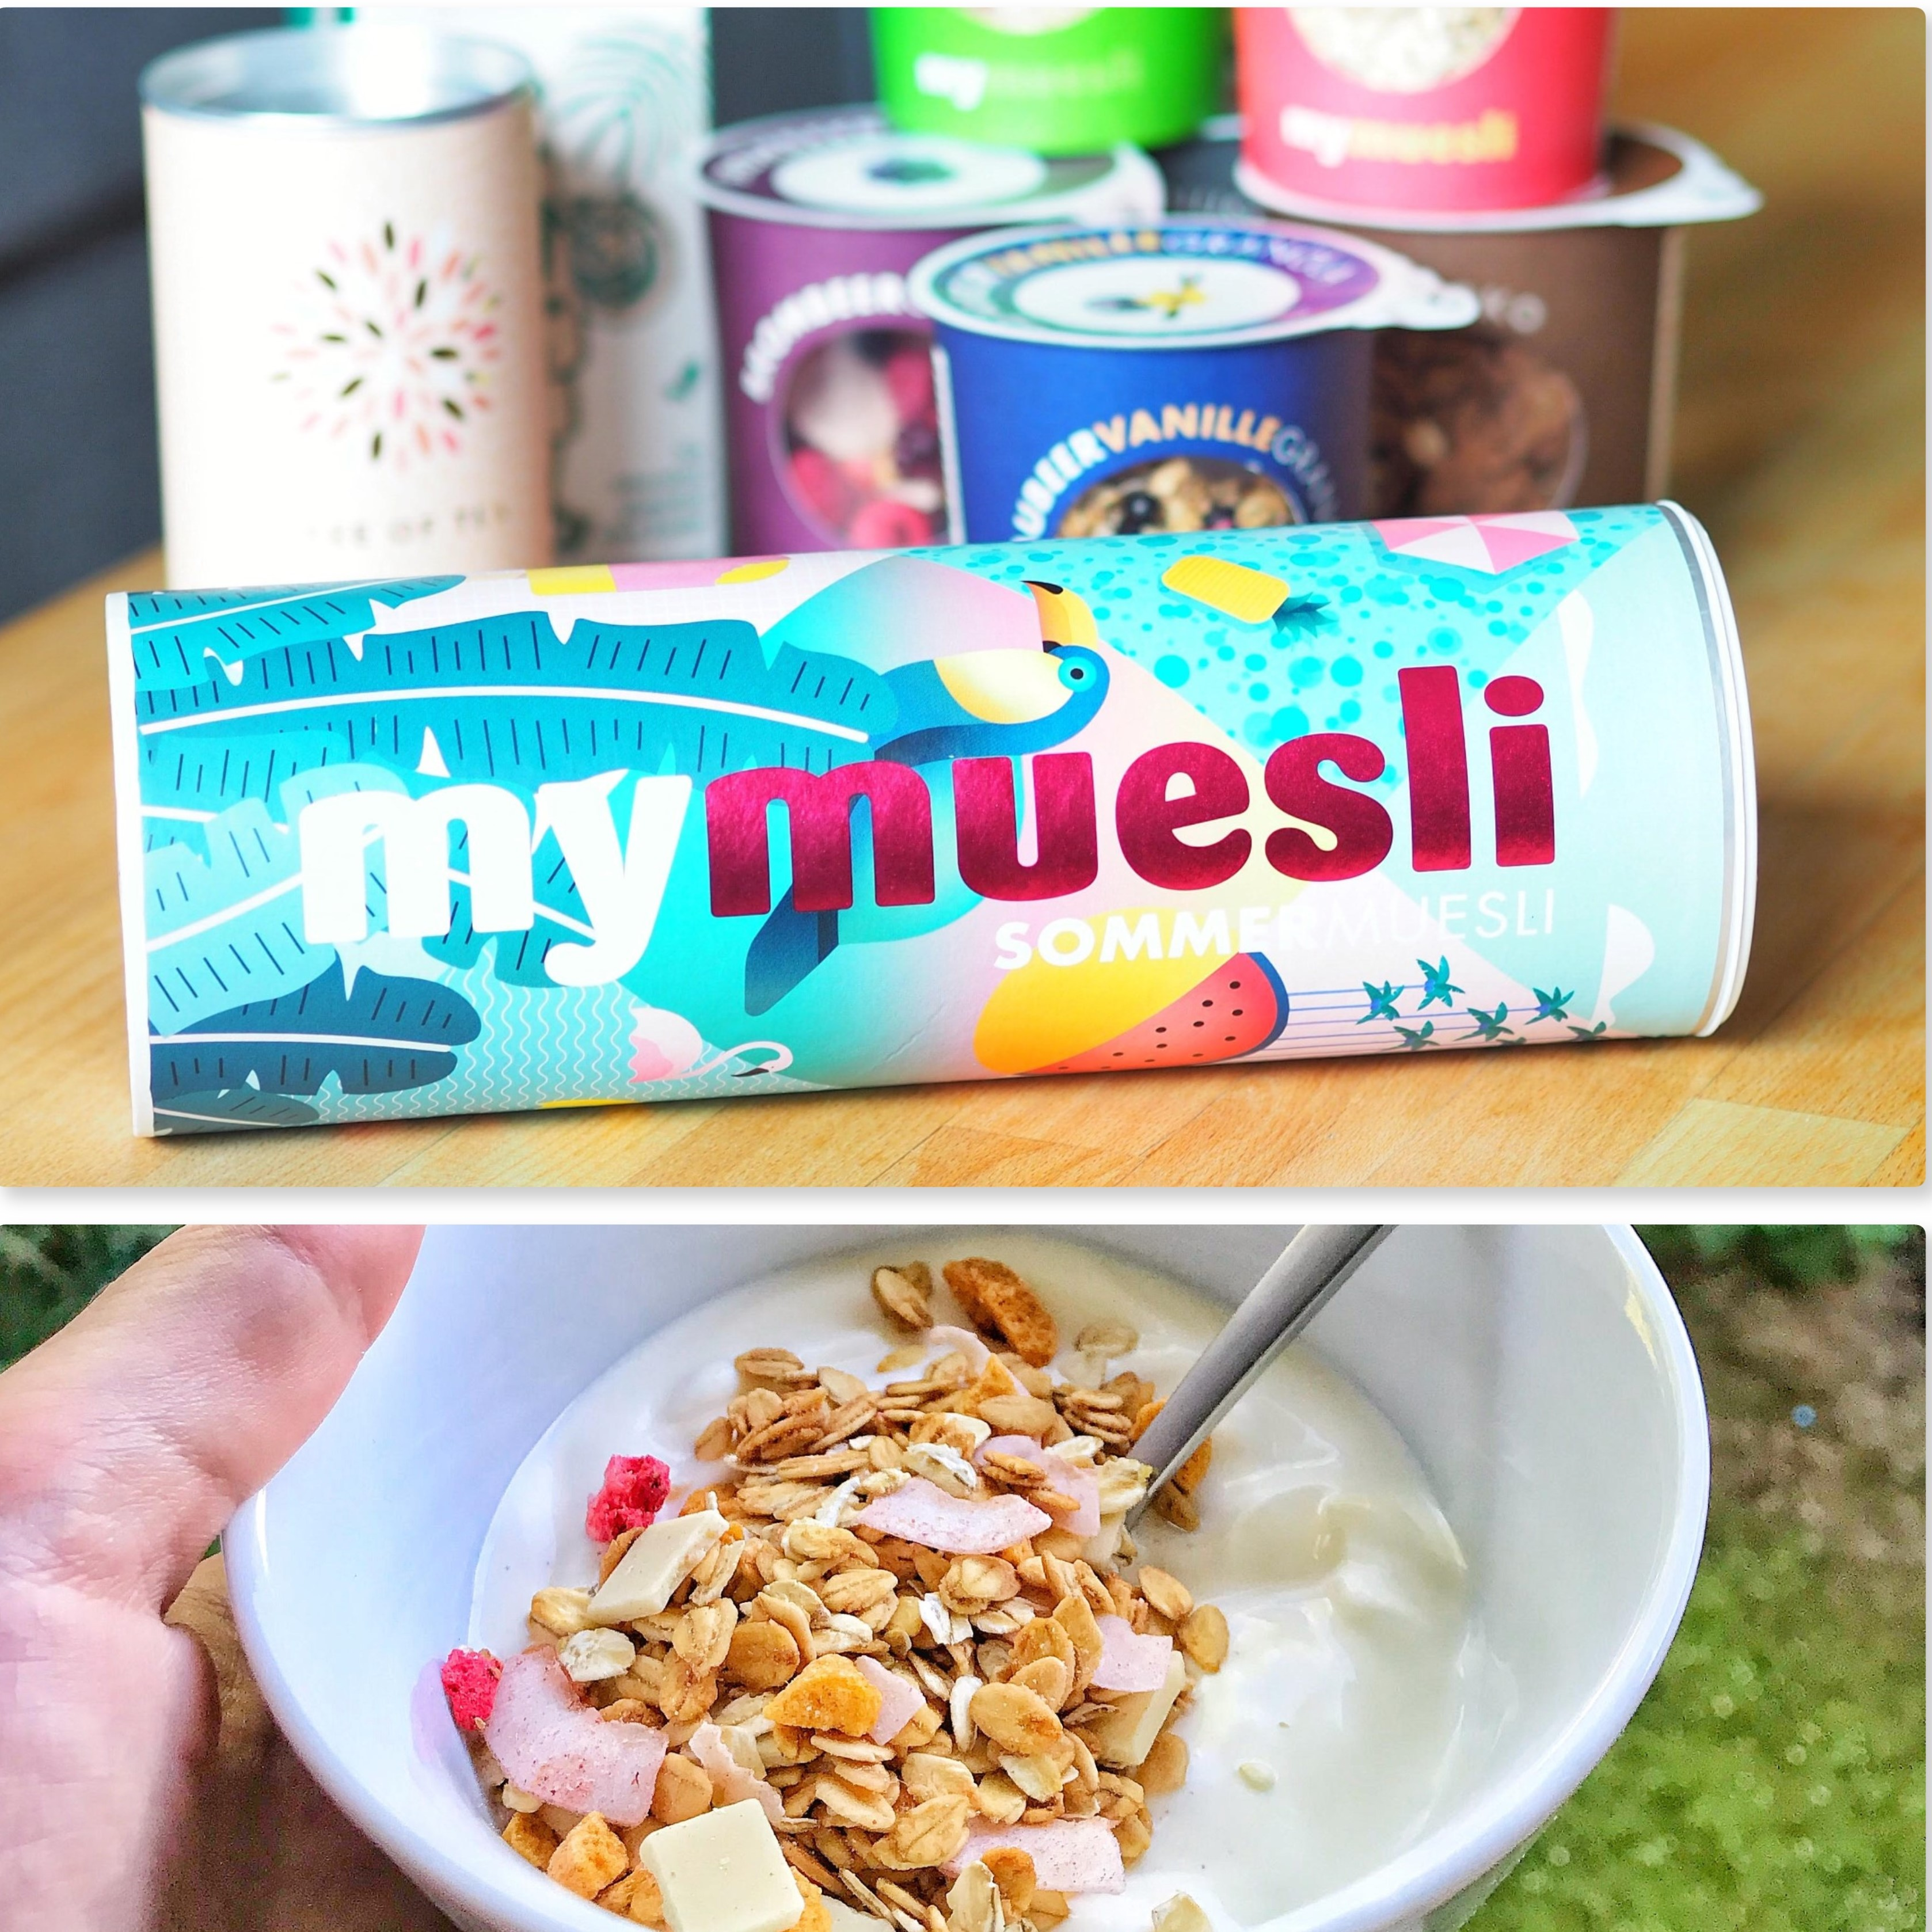 my muesli summer muesli